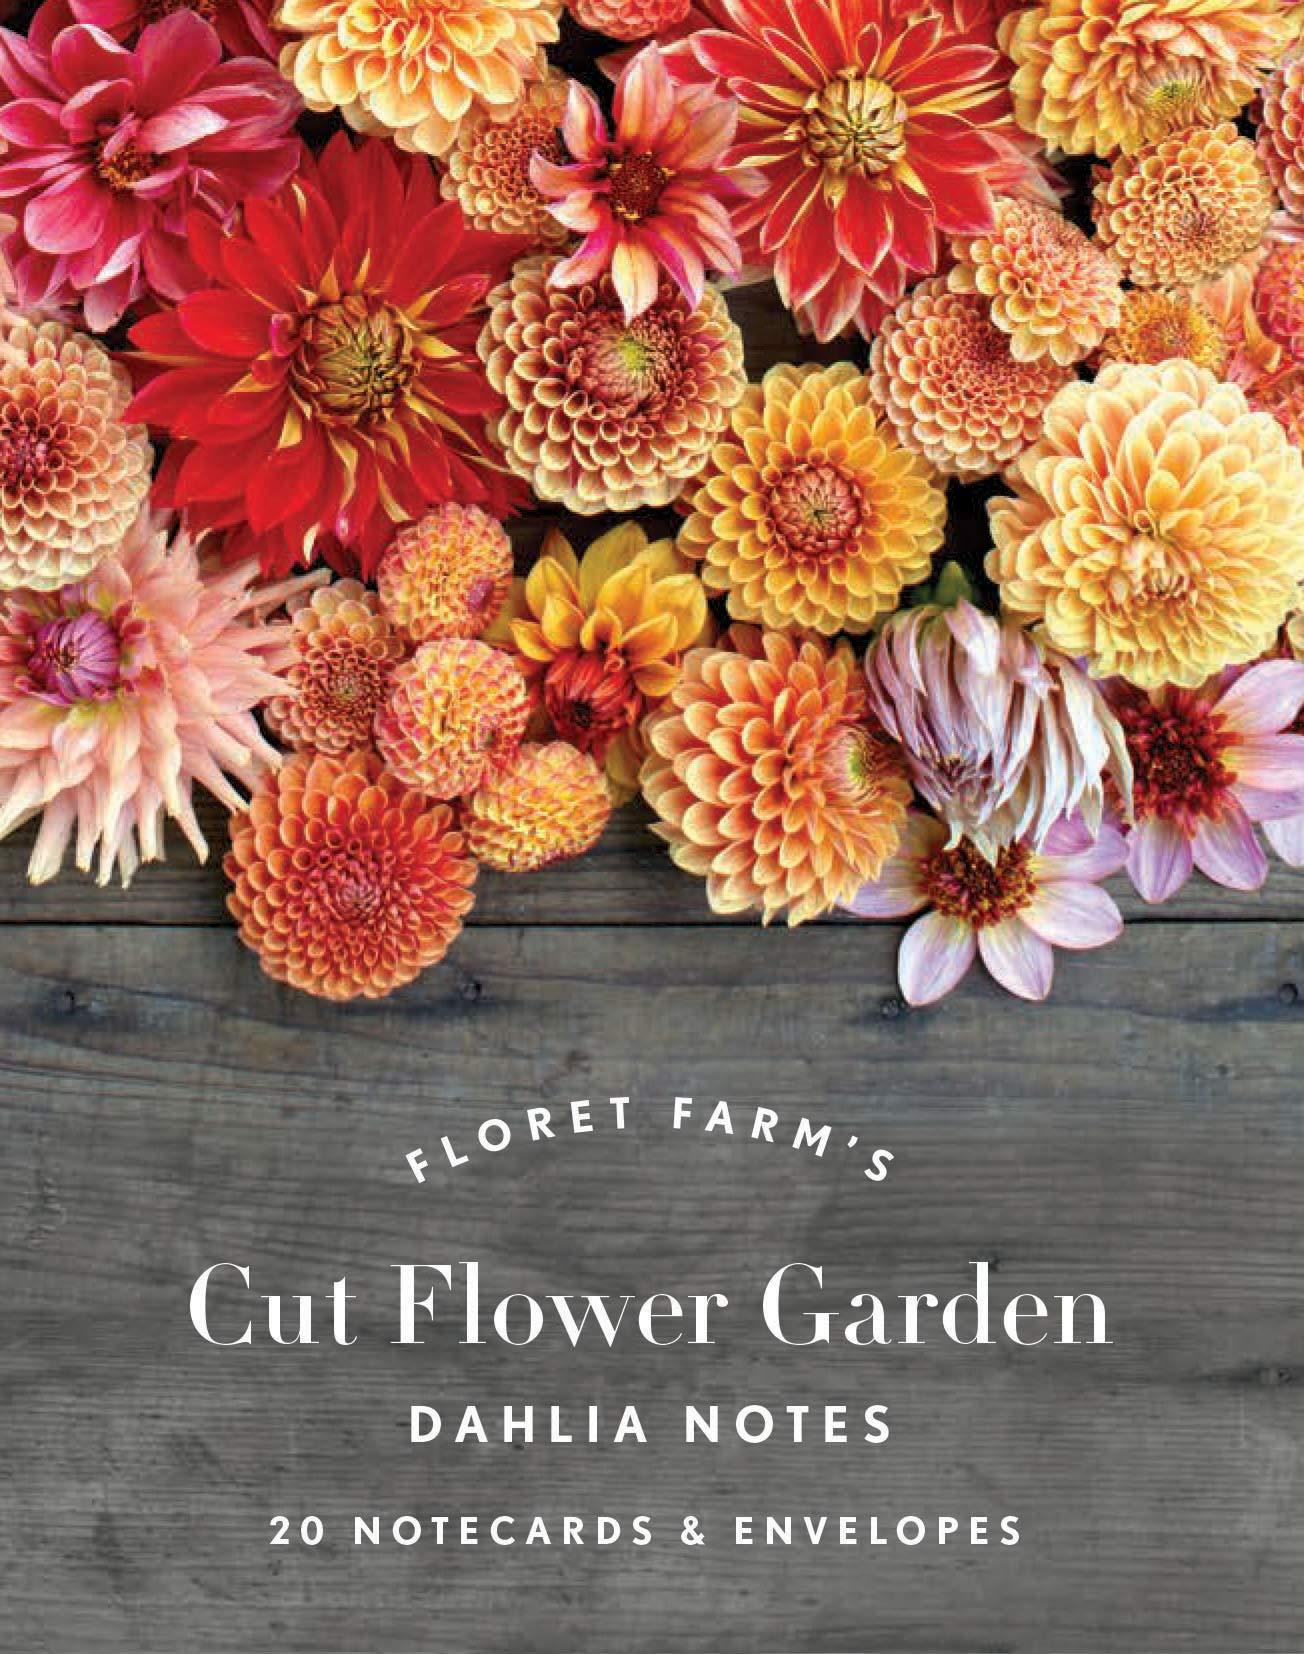 Floret Farm's Cut Flower Garden: Dahlia Notes: 20 Notecards & Envelopes (Floral Stationery, Flower Themed Blank Notecards)